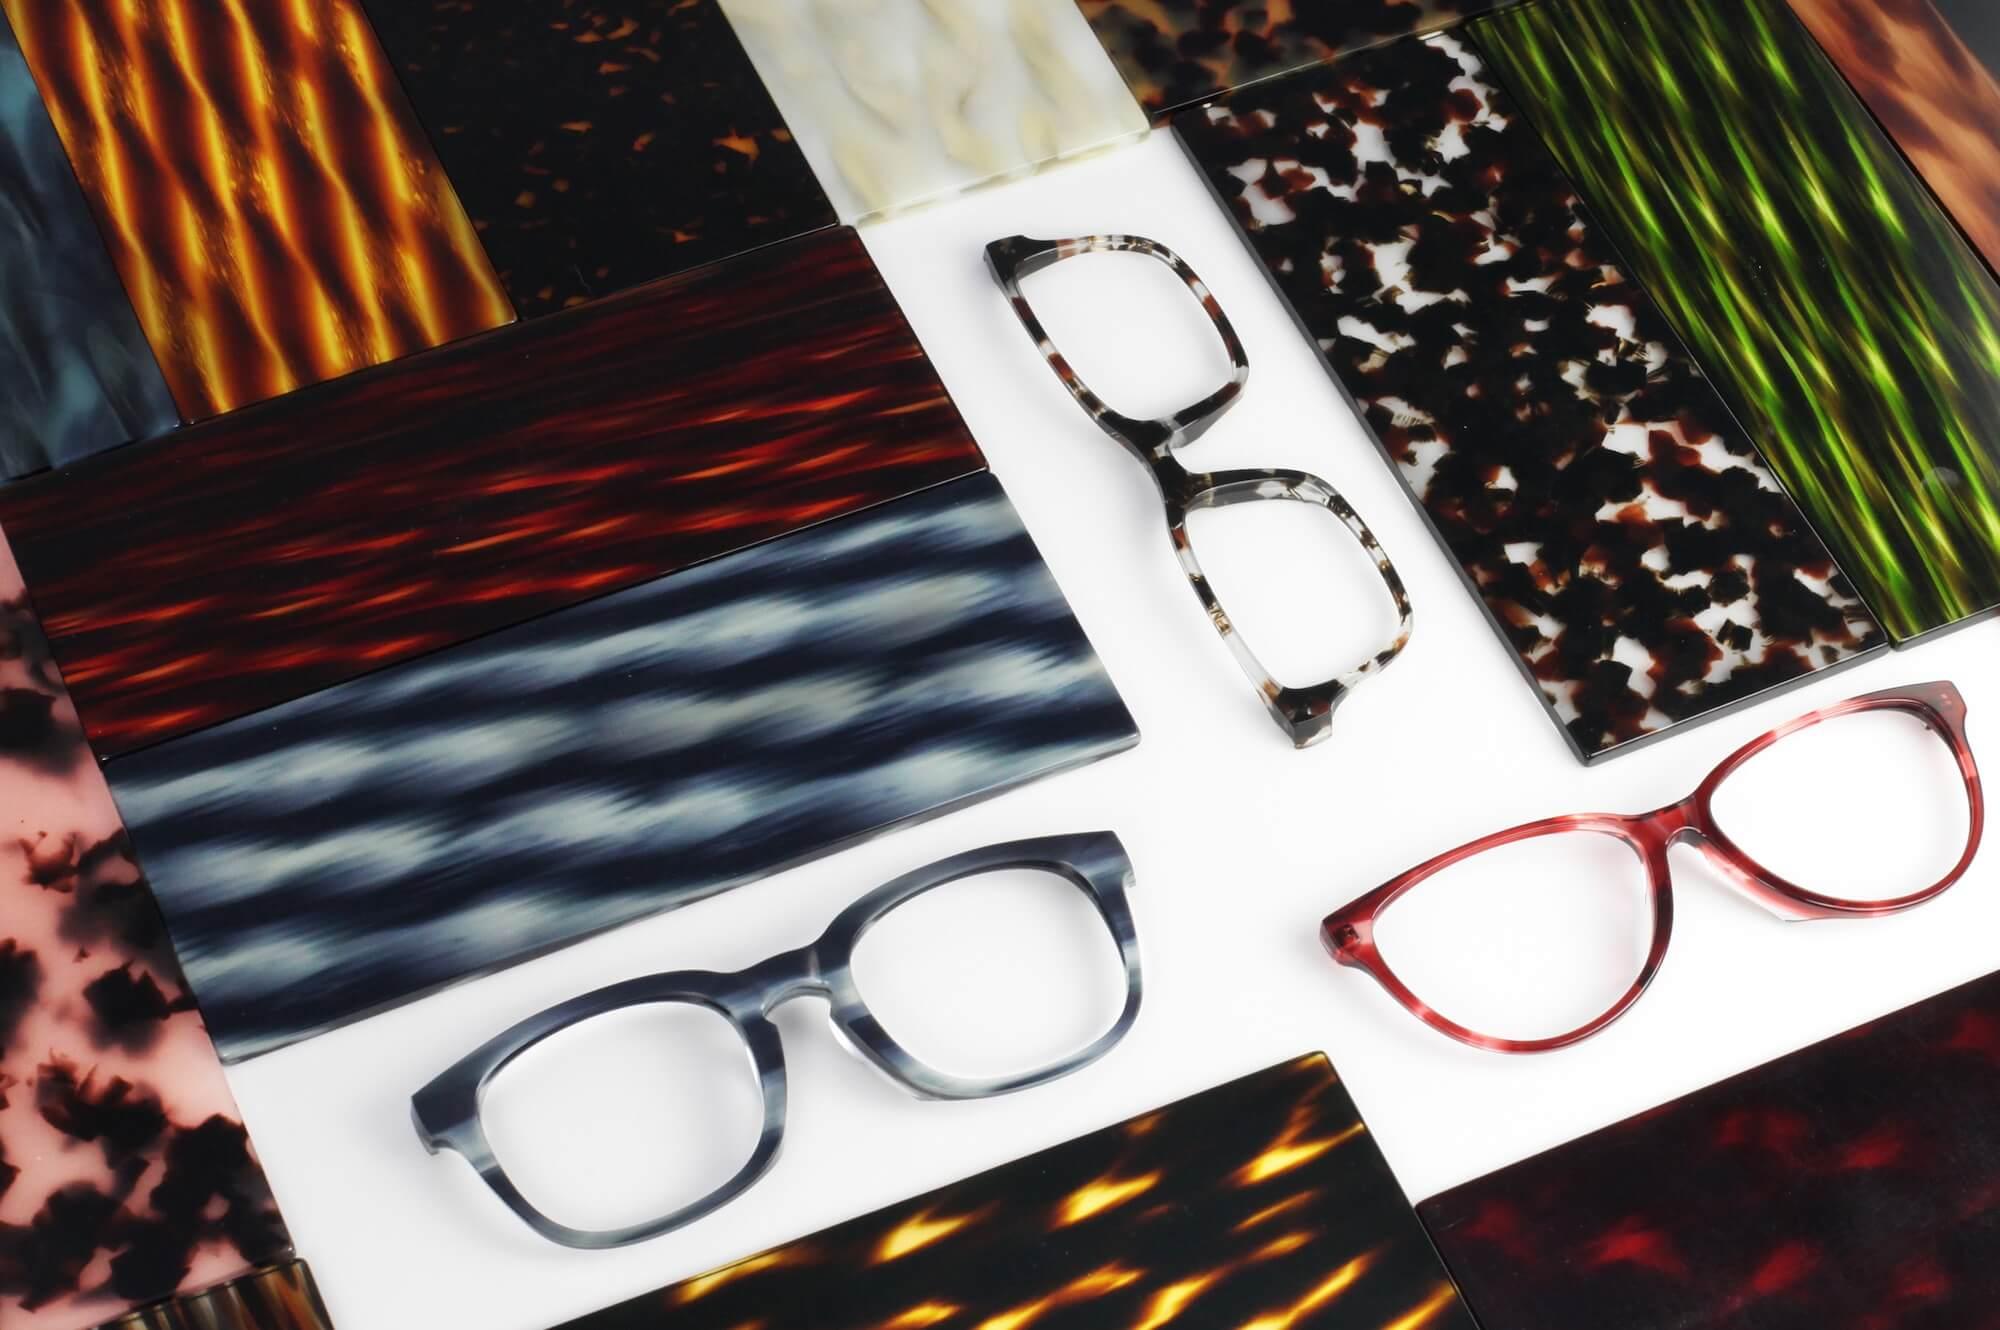 Custom acetate for bespoke eyeglasses and sunglasses